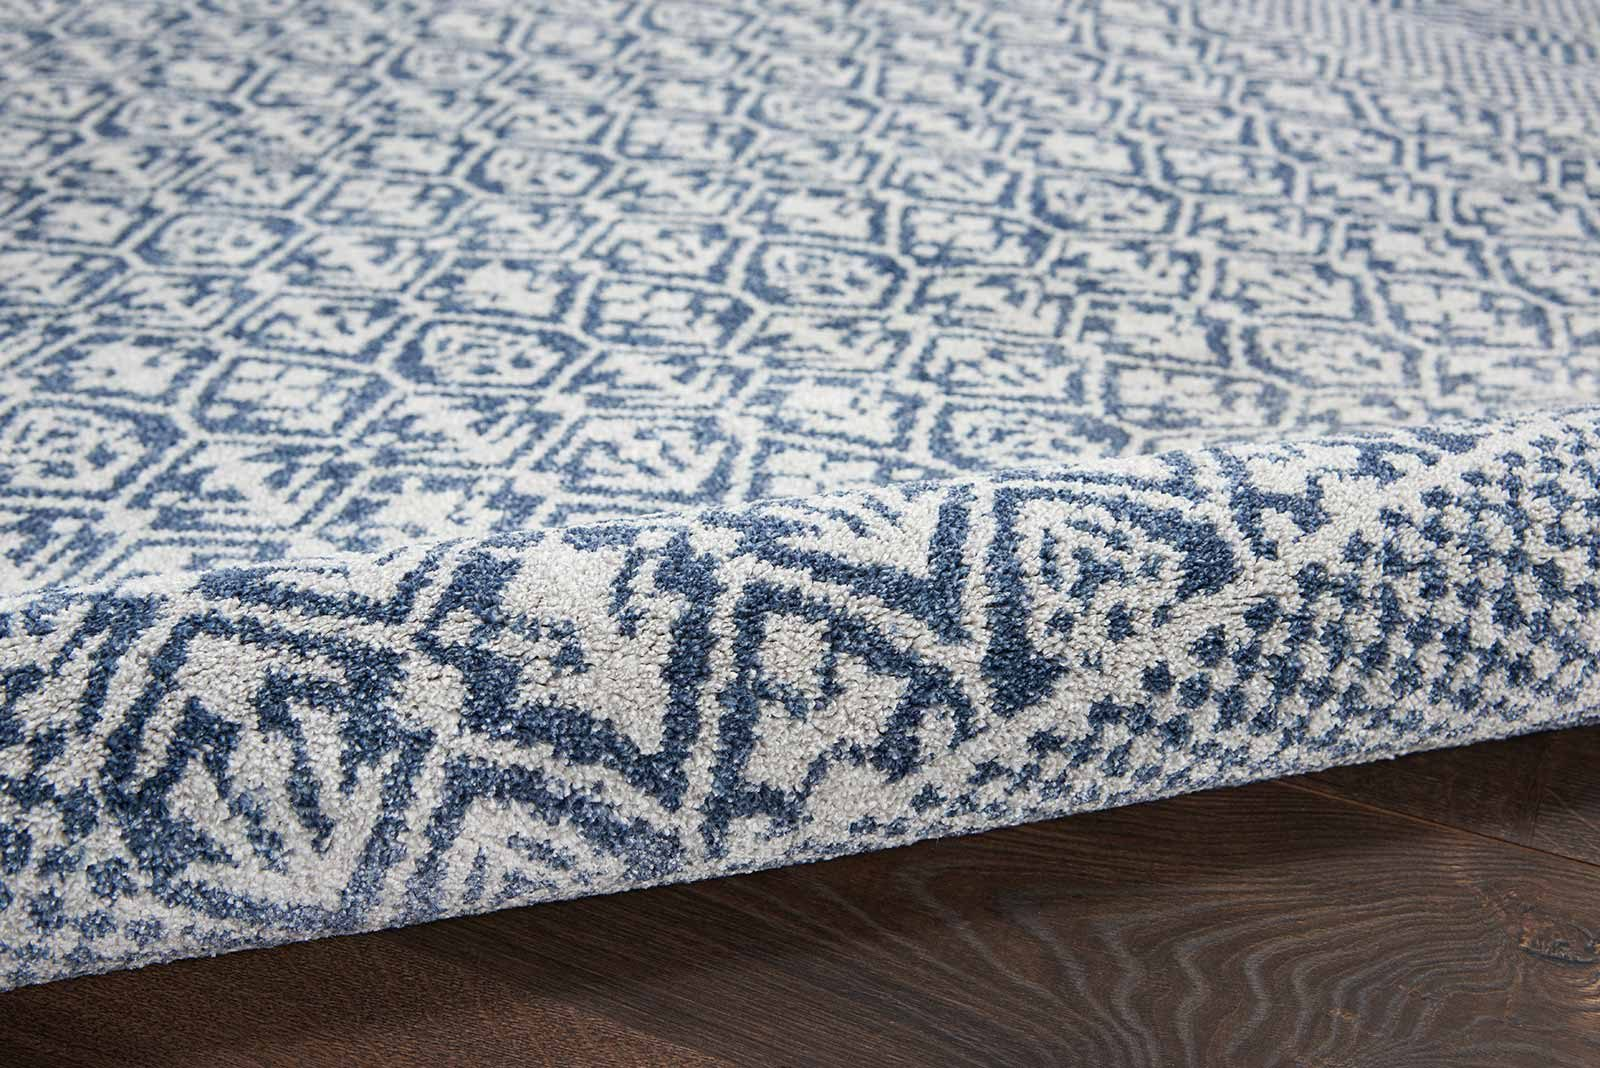 Nourison rug Palermo PMR01 BLUE GREY 5x7 099446719669 TX01 C